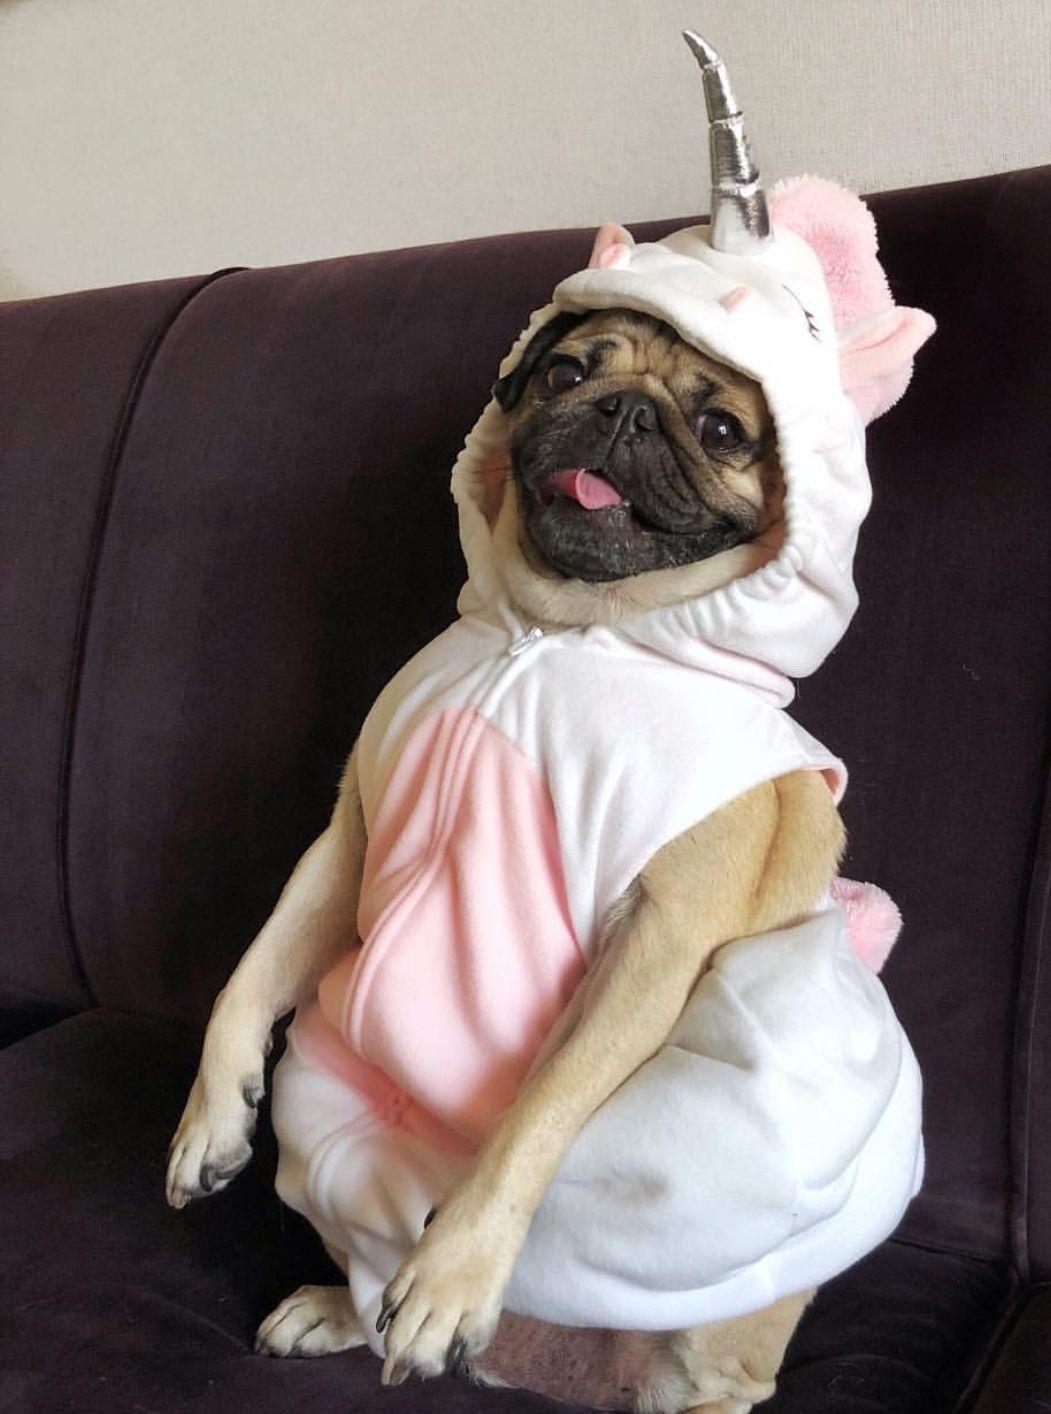 dc6100e8d Pugicorn Doug The Pug, Animal Dress Up, Bizarre, Pekingese, Pug Life,